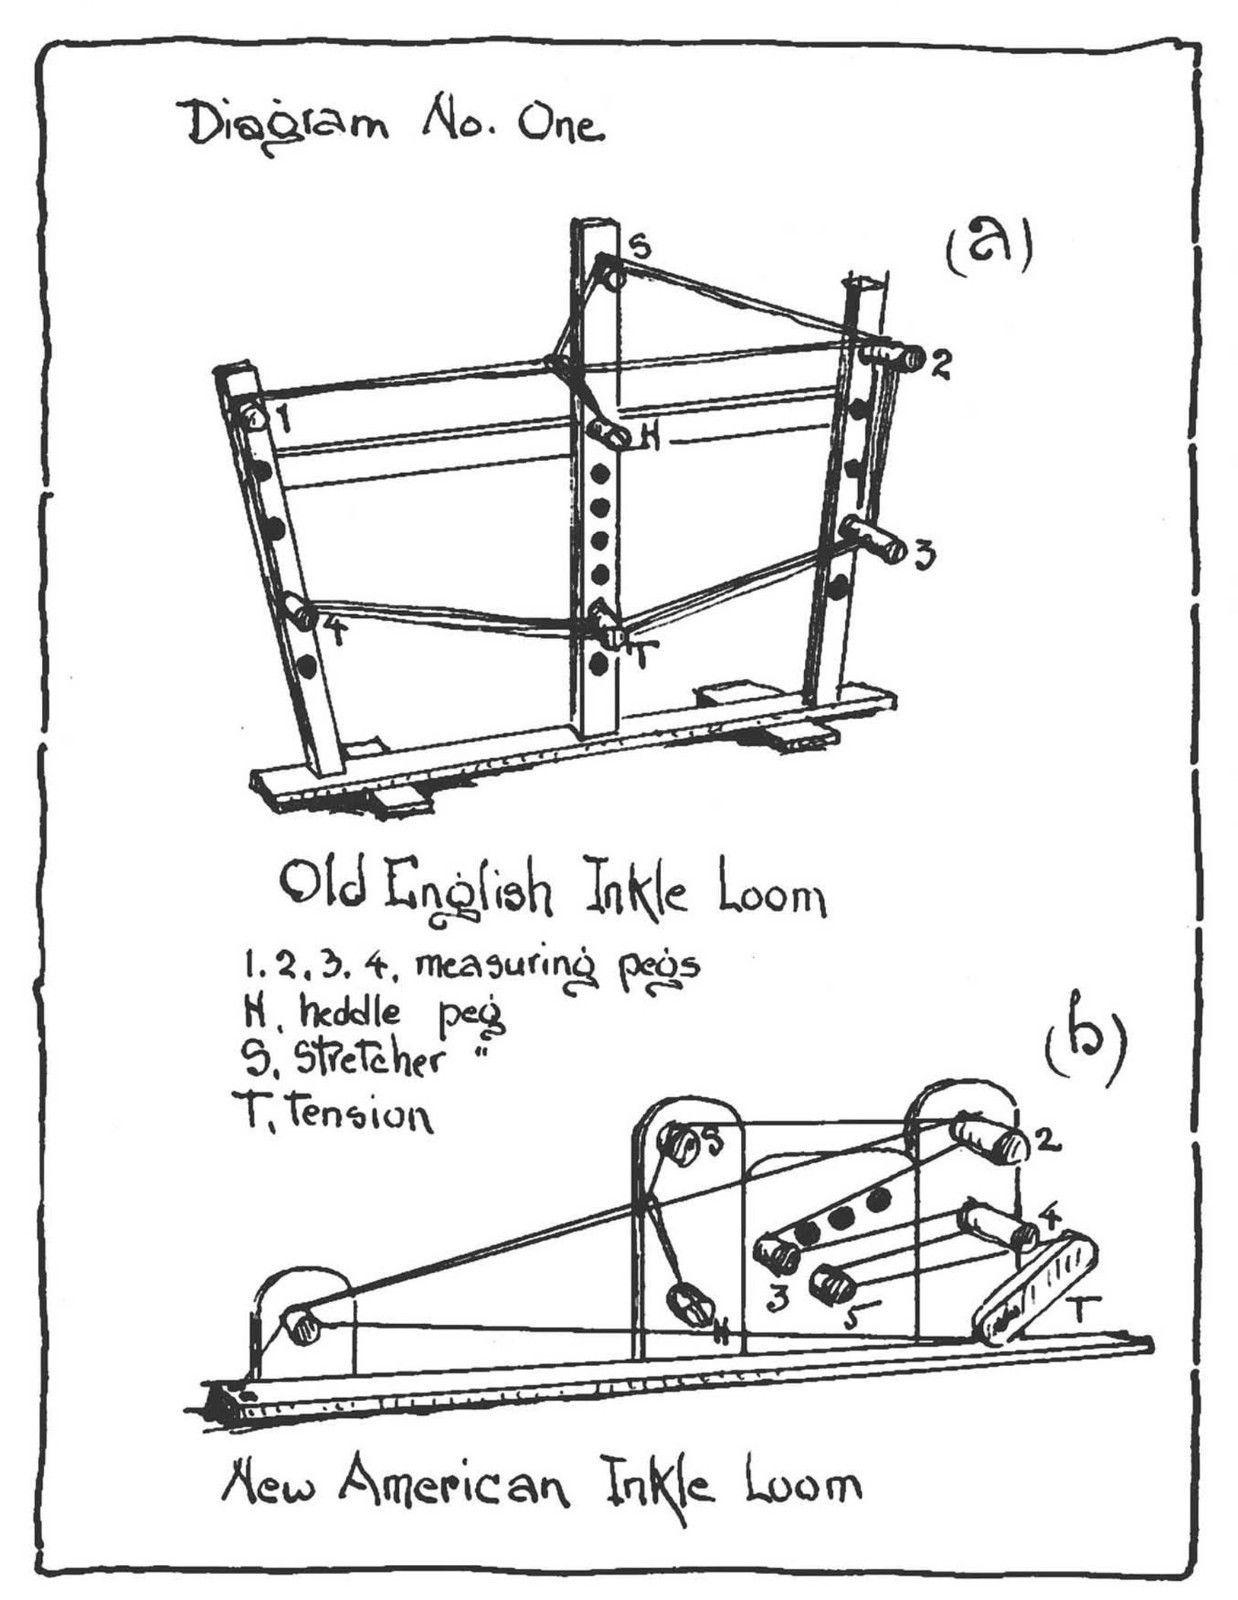 1941 Inkle Loom Book Card Tablet Weaving 24 and 50 similar